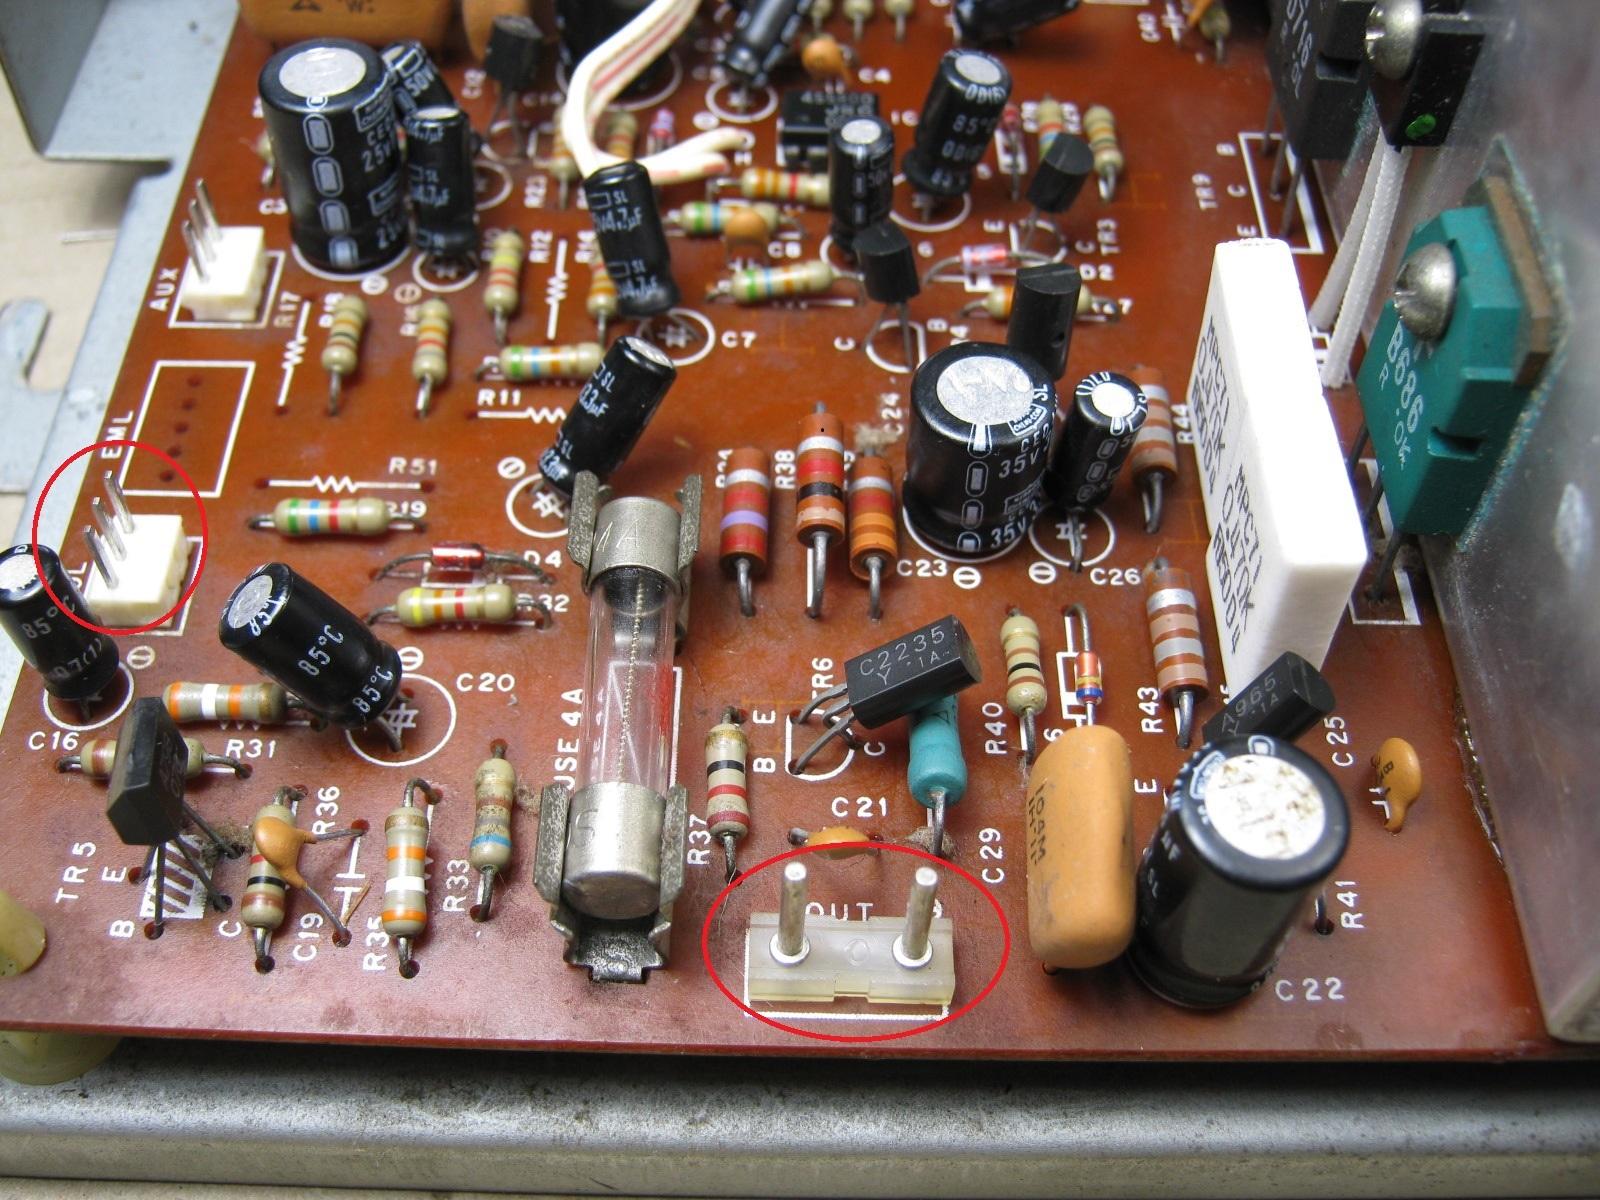 COLUMBIA電気ピアノ(抵抗不良)基板パワーアンプ印付き